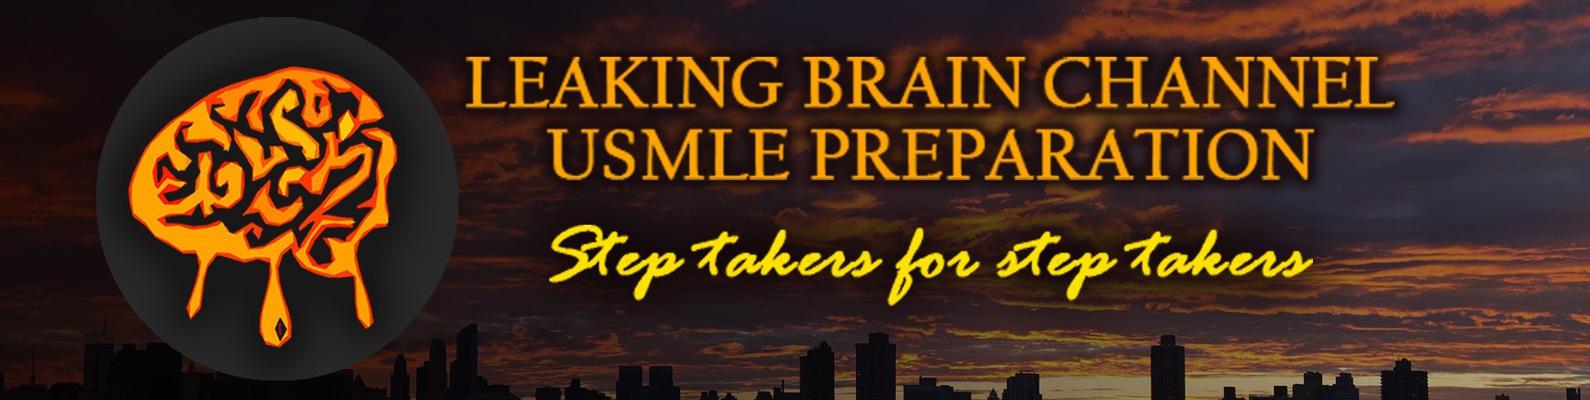 Leaking Brain Channel (USMLE preparation)   ВКонтакте